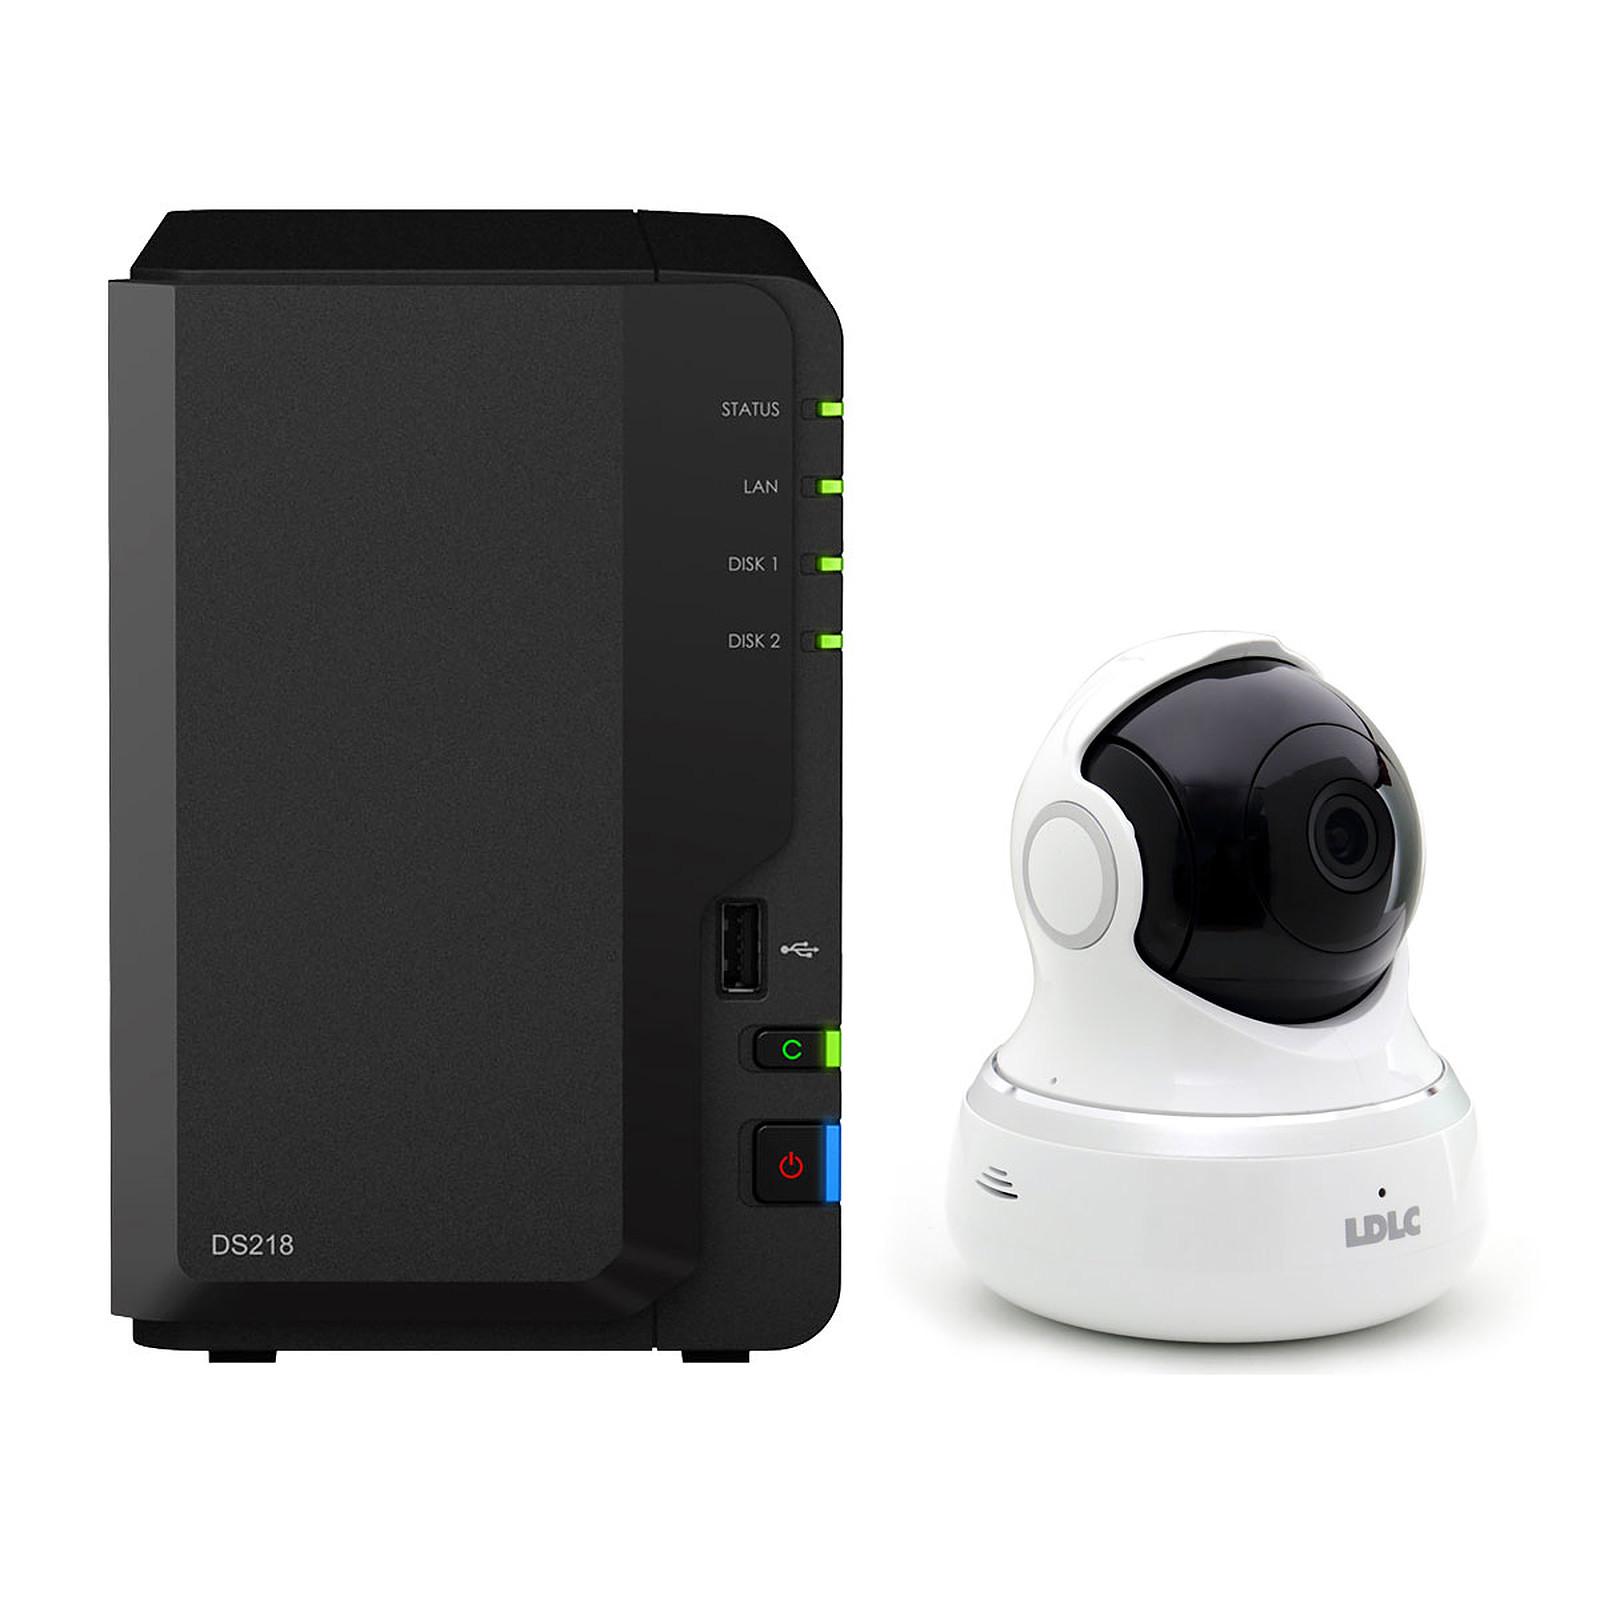 Synology DiskStation DS218 avec caméra LDLC C6B